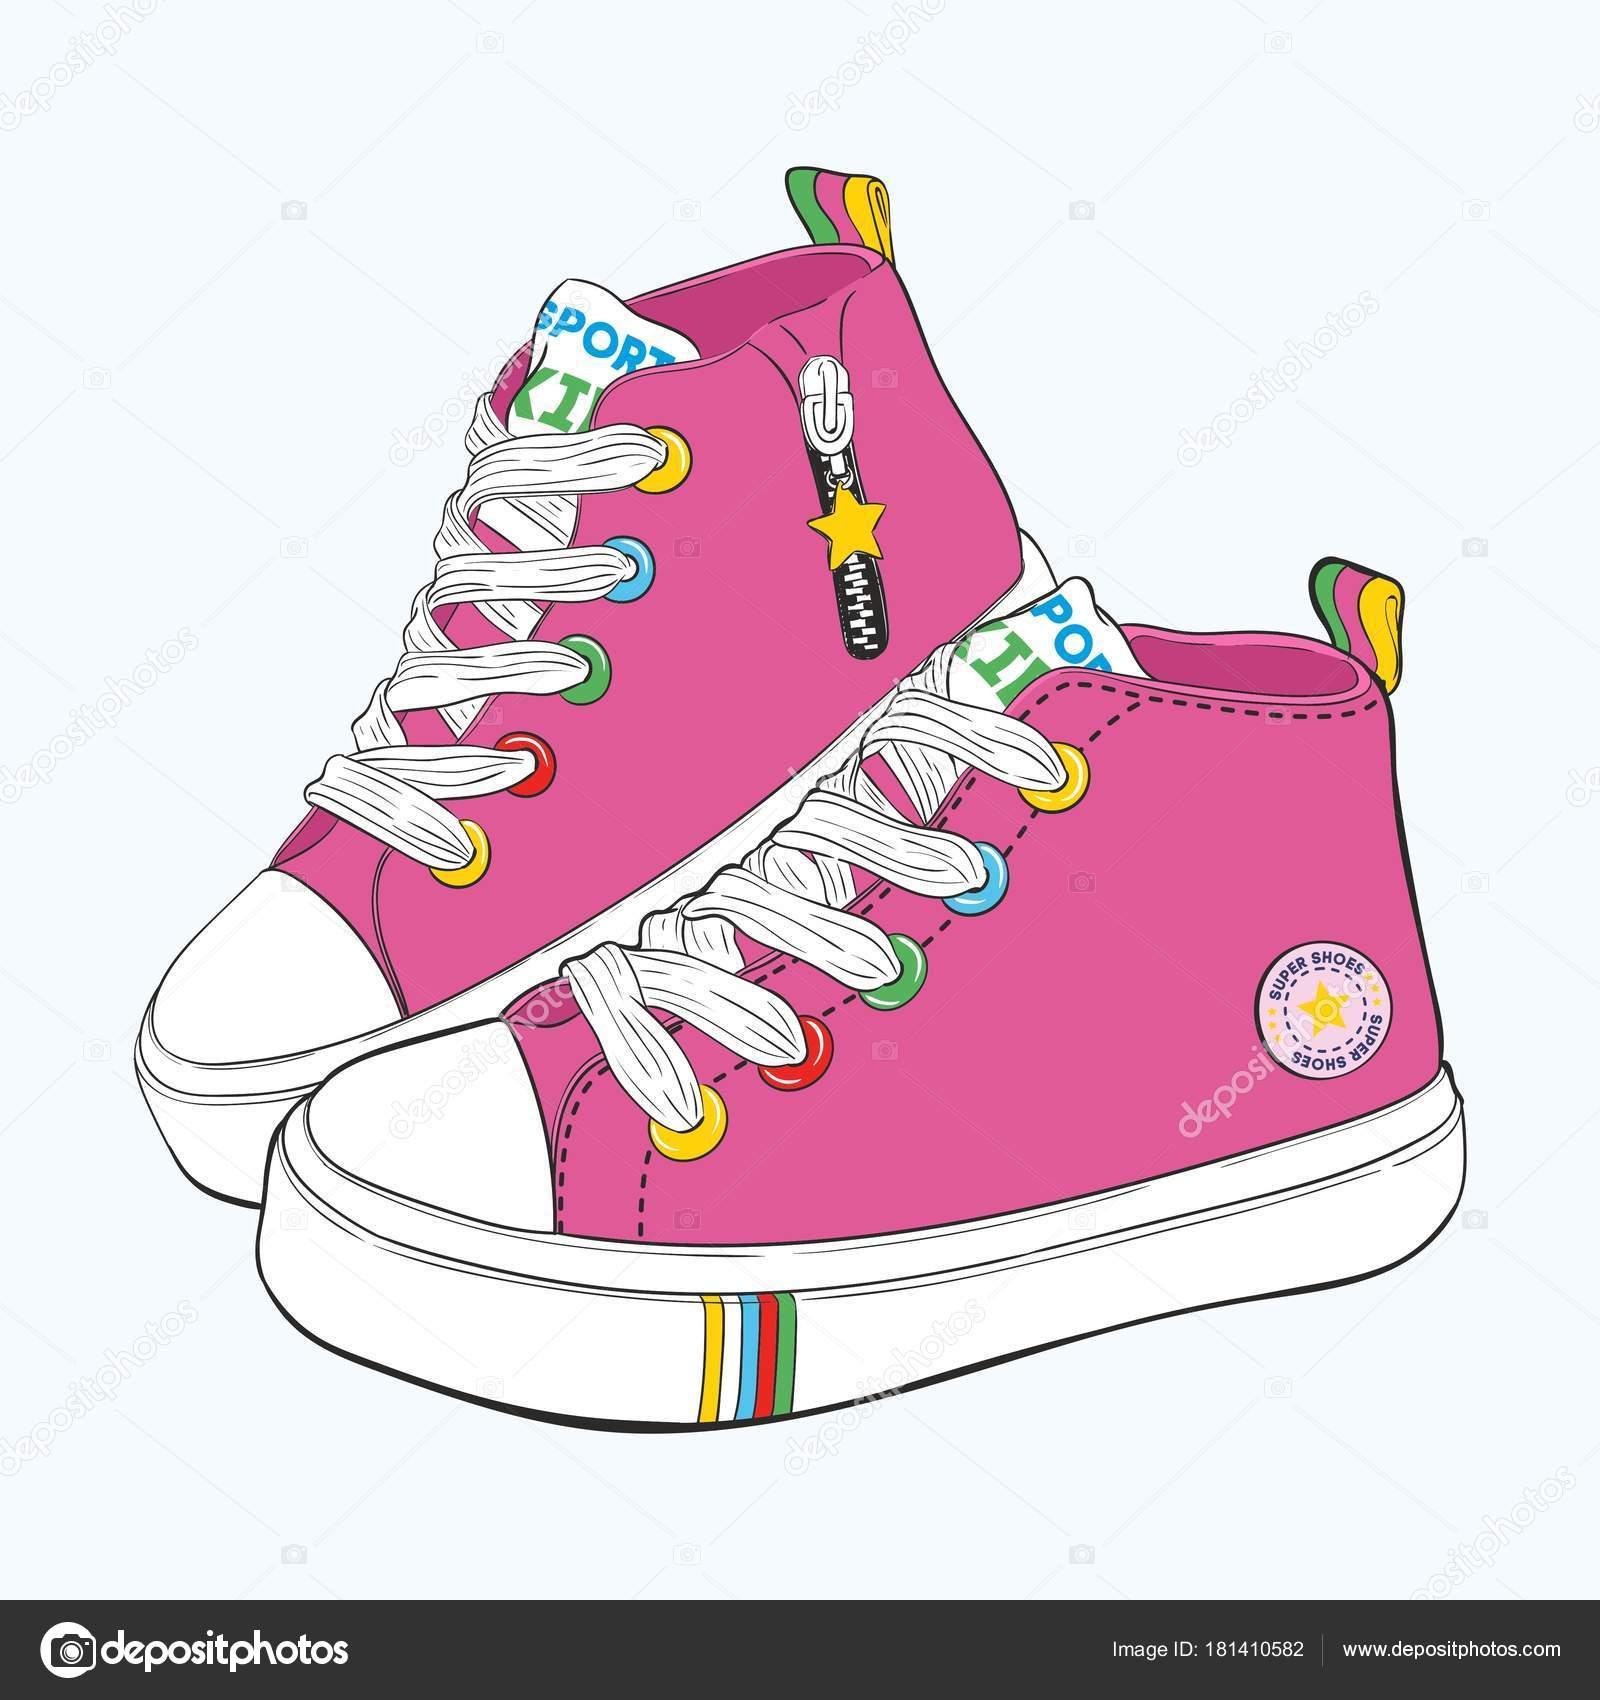 4f7e2d5415c Σετ παιδικά πάνινα παπούτσια. Παραλλαγές σχεδιασμού παπούτσια για κορίτσια  — Διανυσματικό Αρχείο